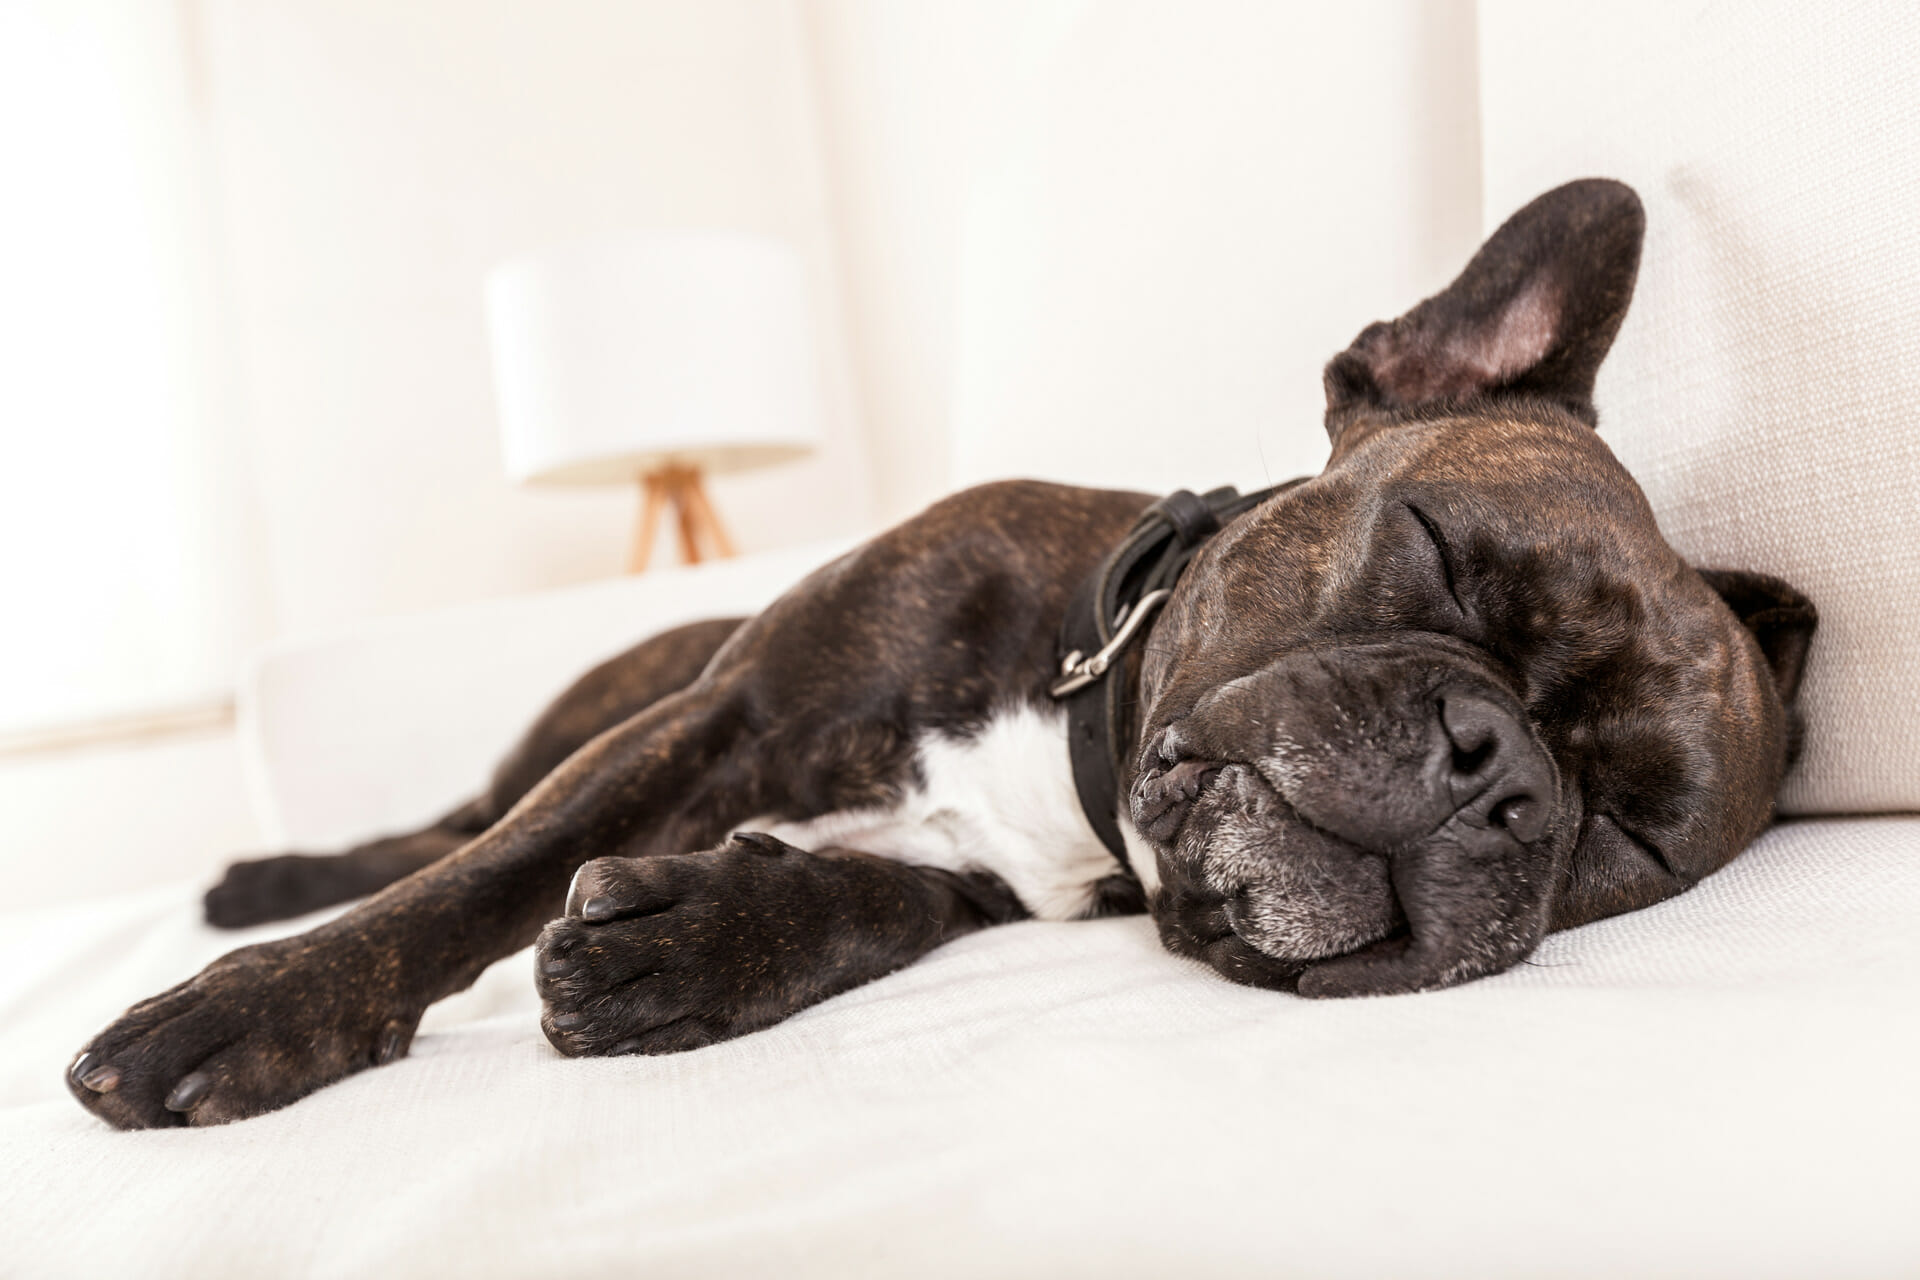 hund kreuzbandriss versicherung